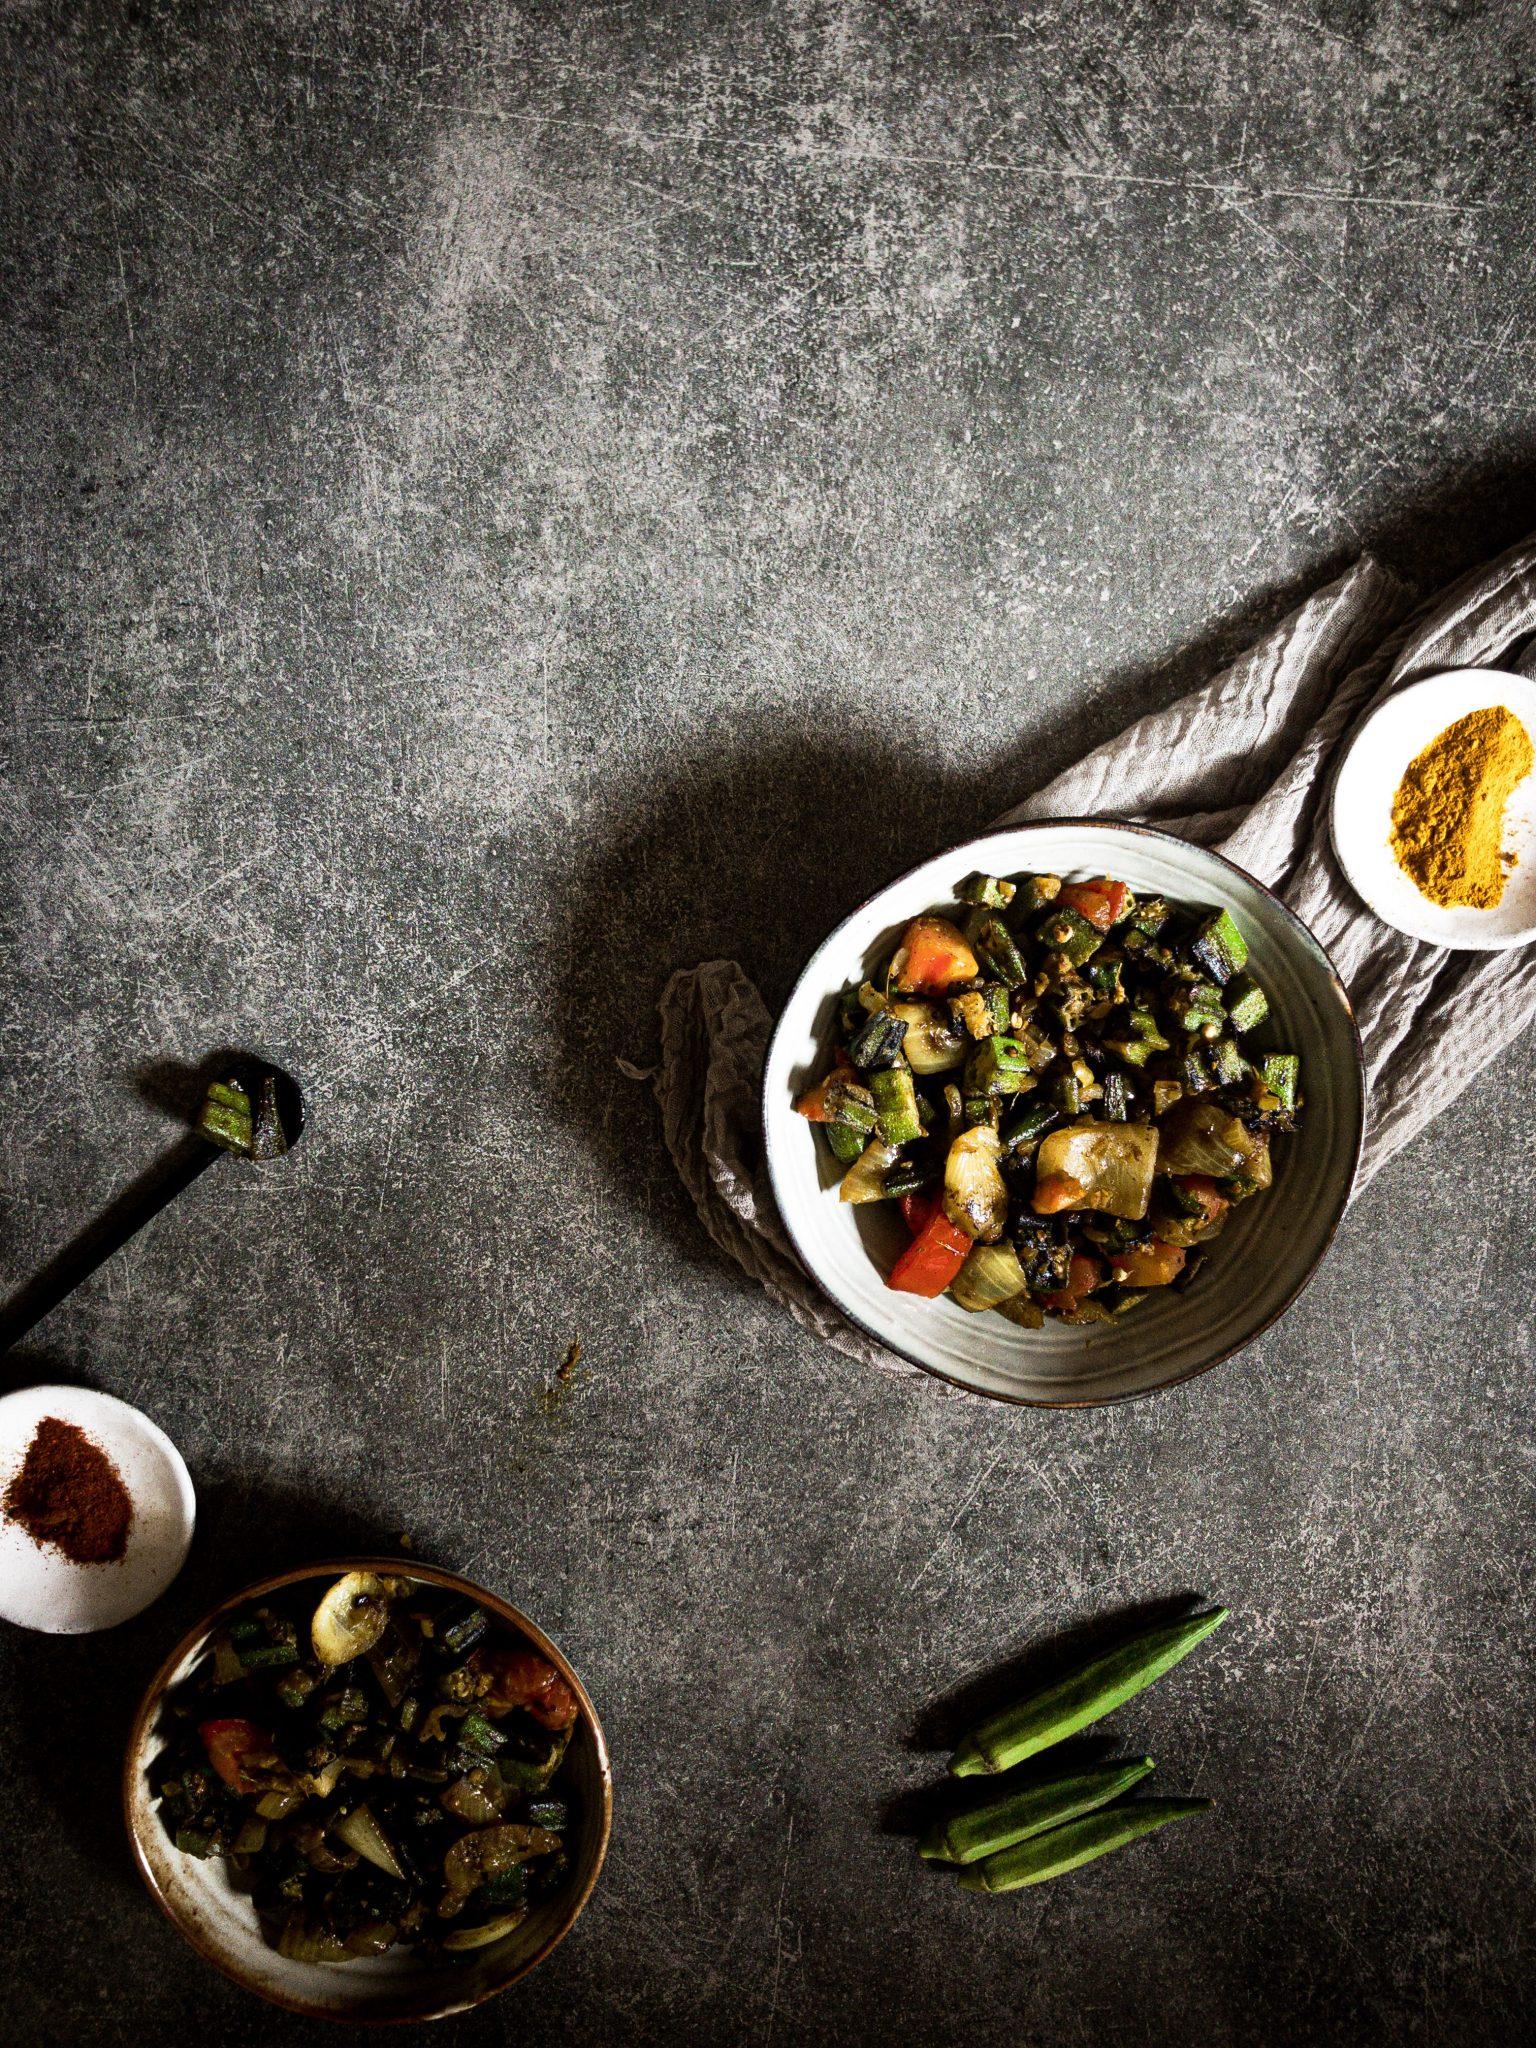 Recipe for making bhindi (okra)